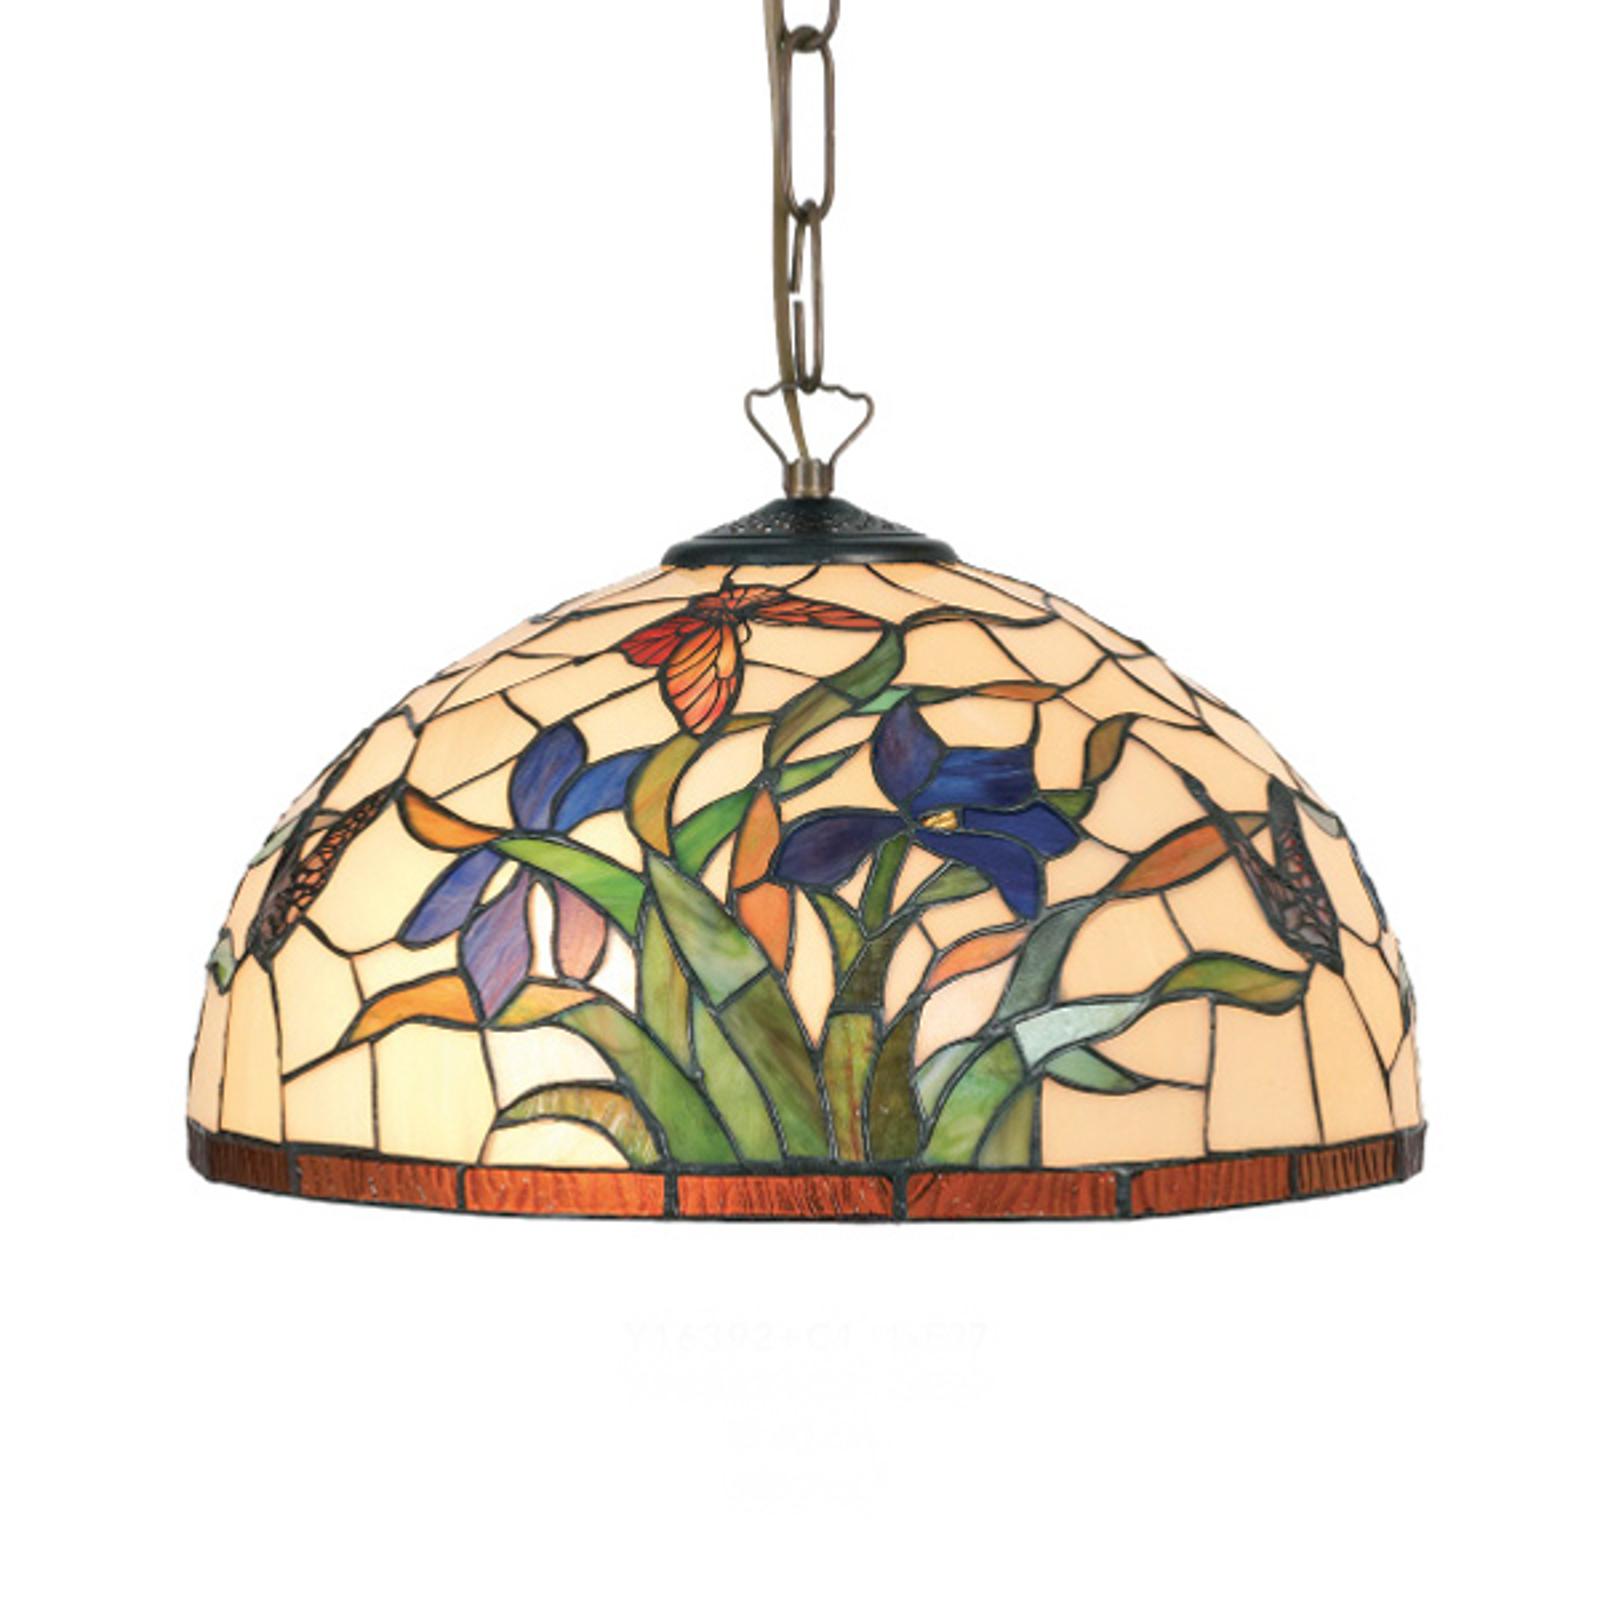 Hanglamp Elanda in Tiffany-stijl 2-lichts